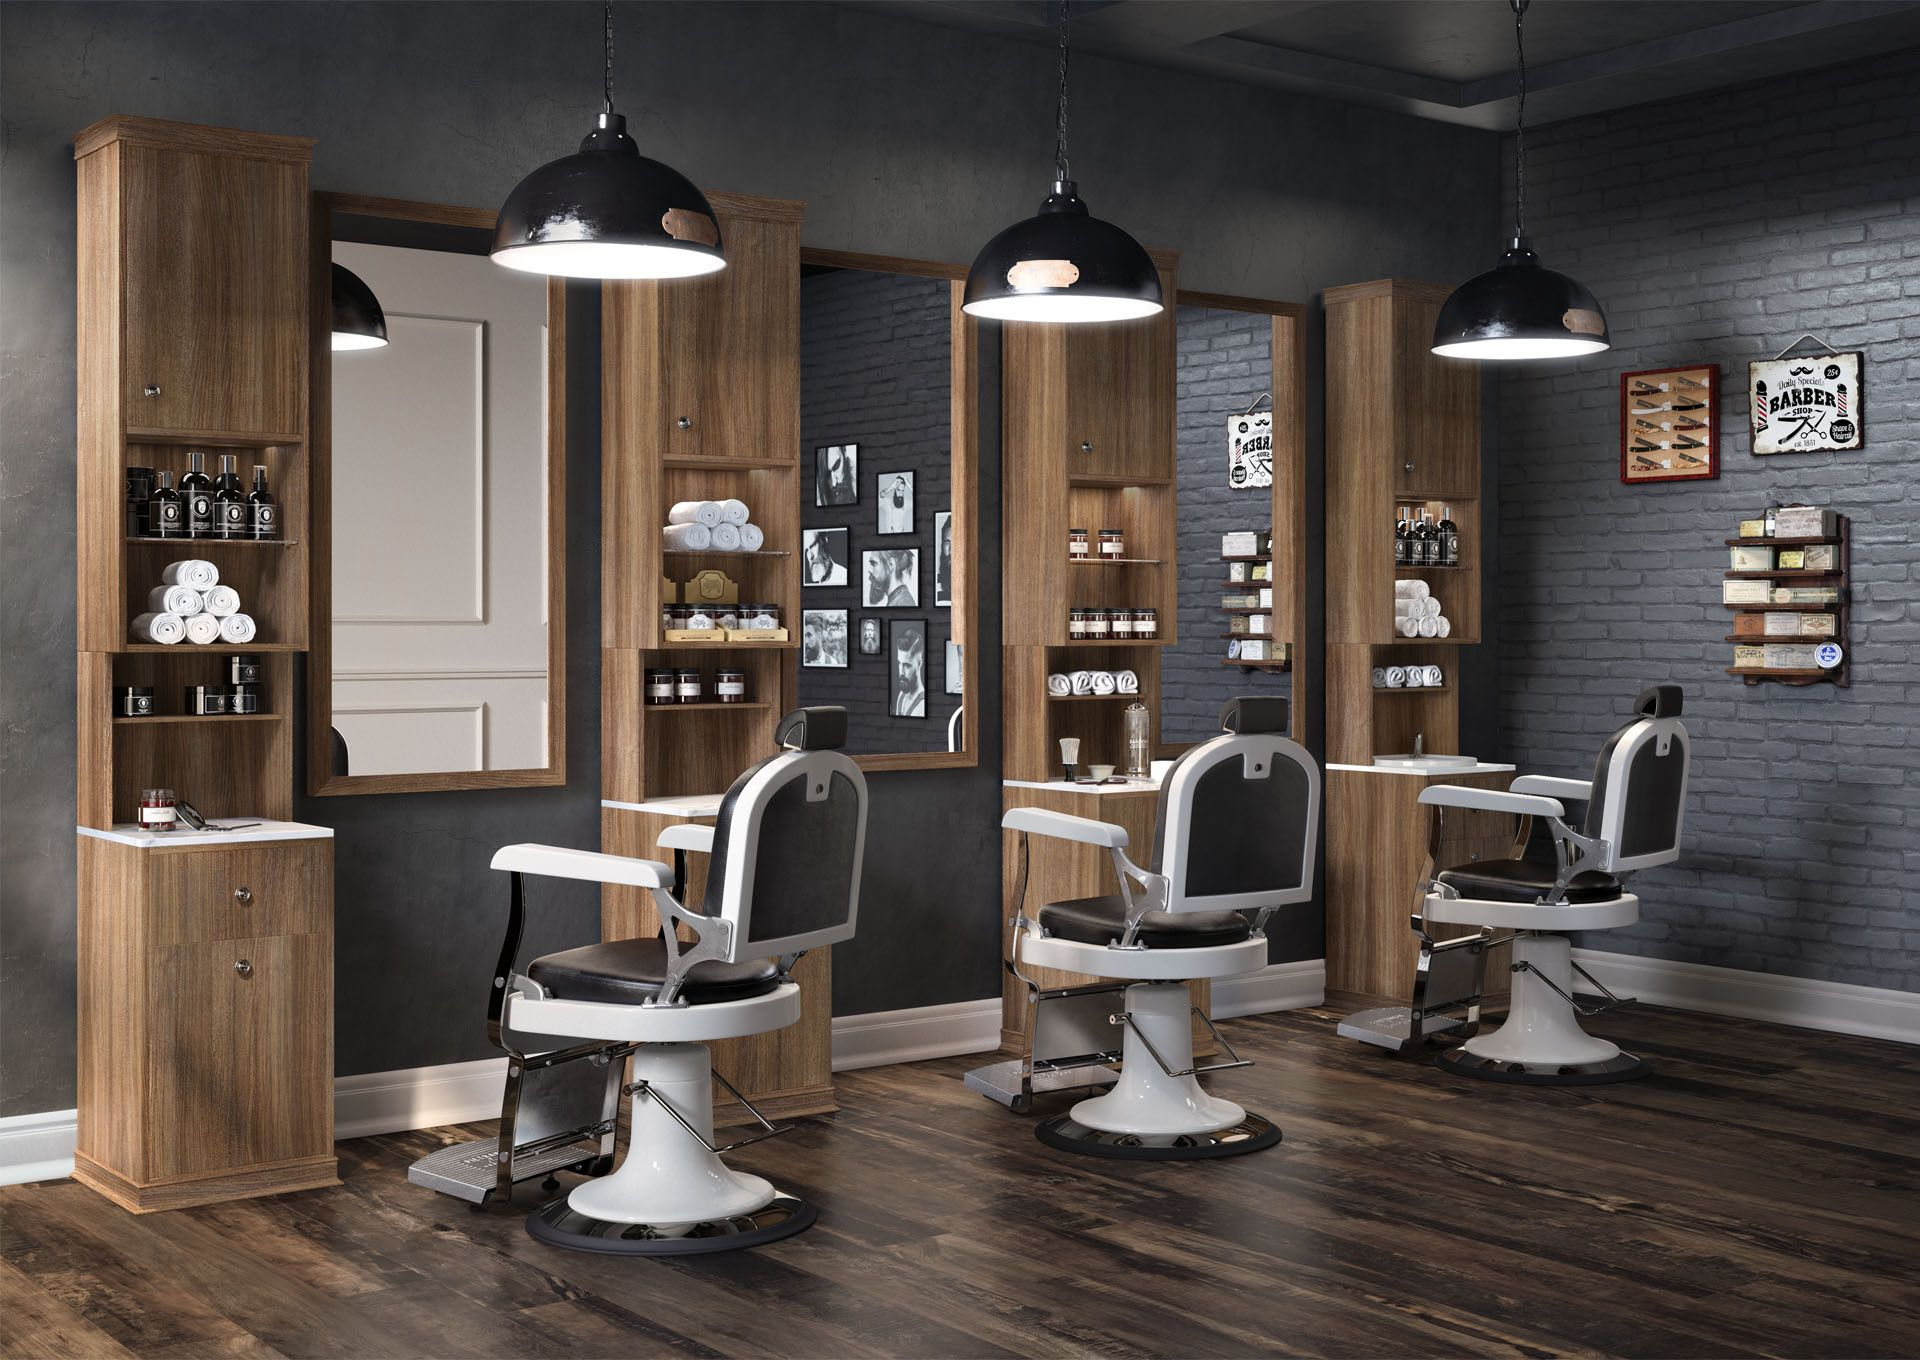 barber shop decor